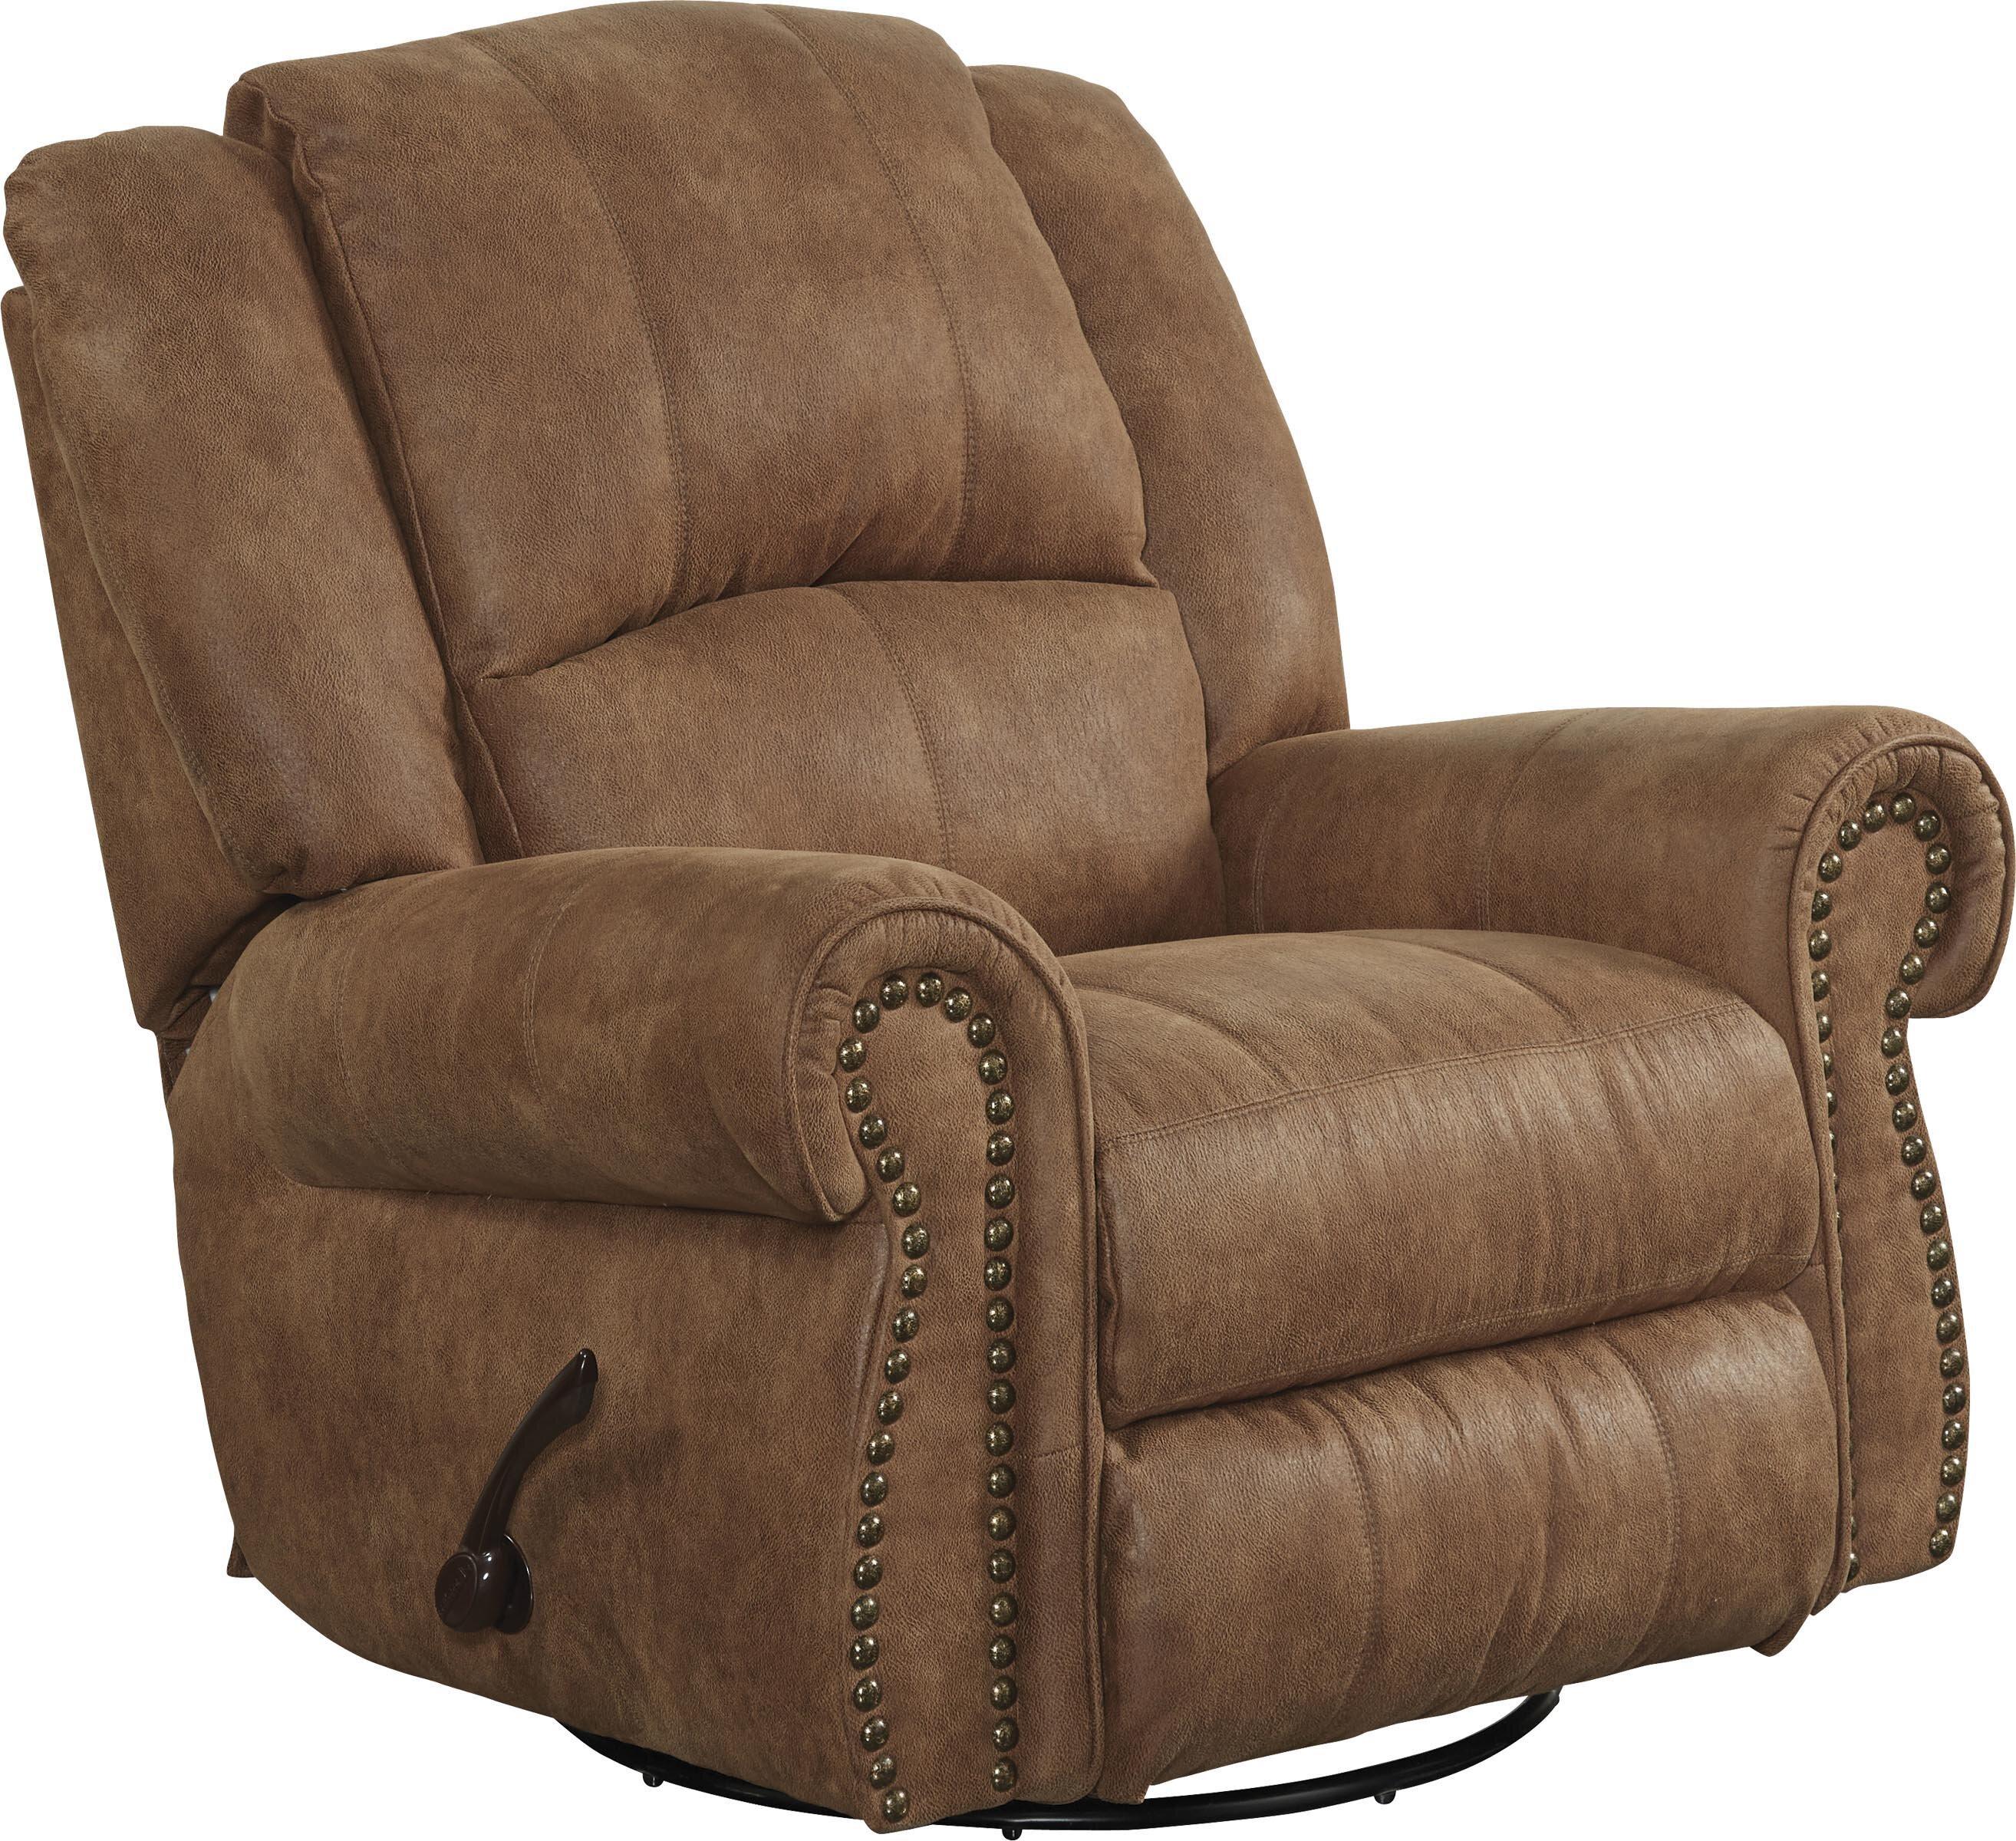 Miraculous Westin Glider Power Recliner Creativecarmelina Interior Chair Design Creativecarmelinacom